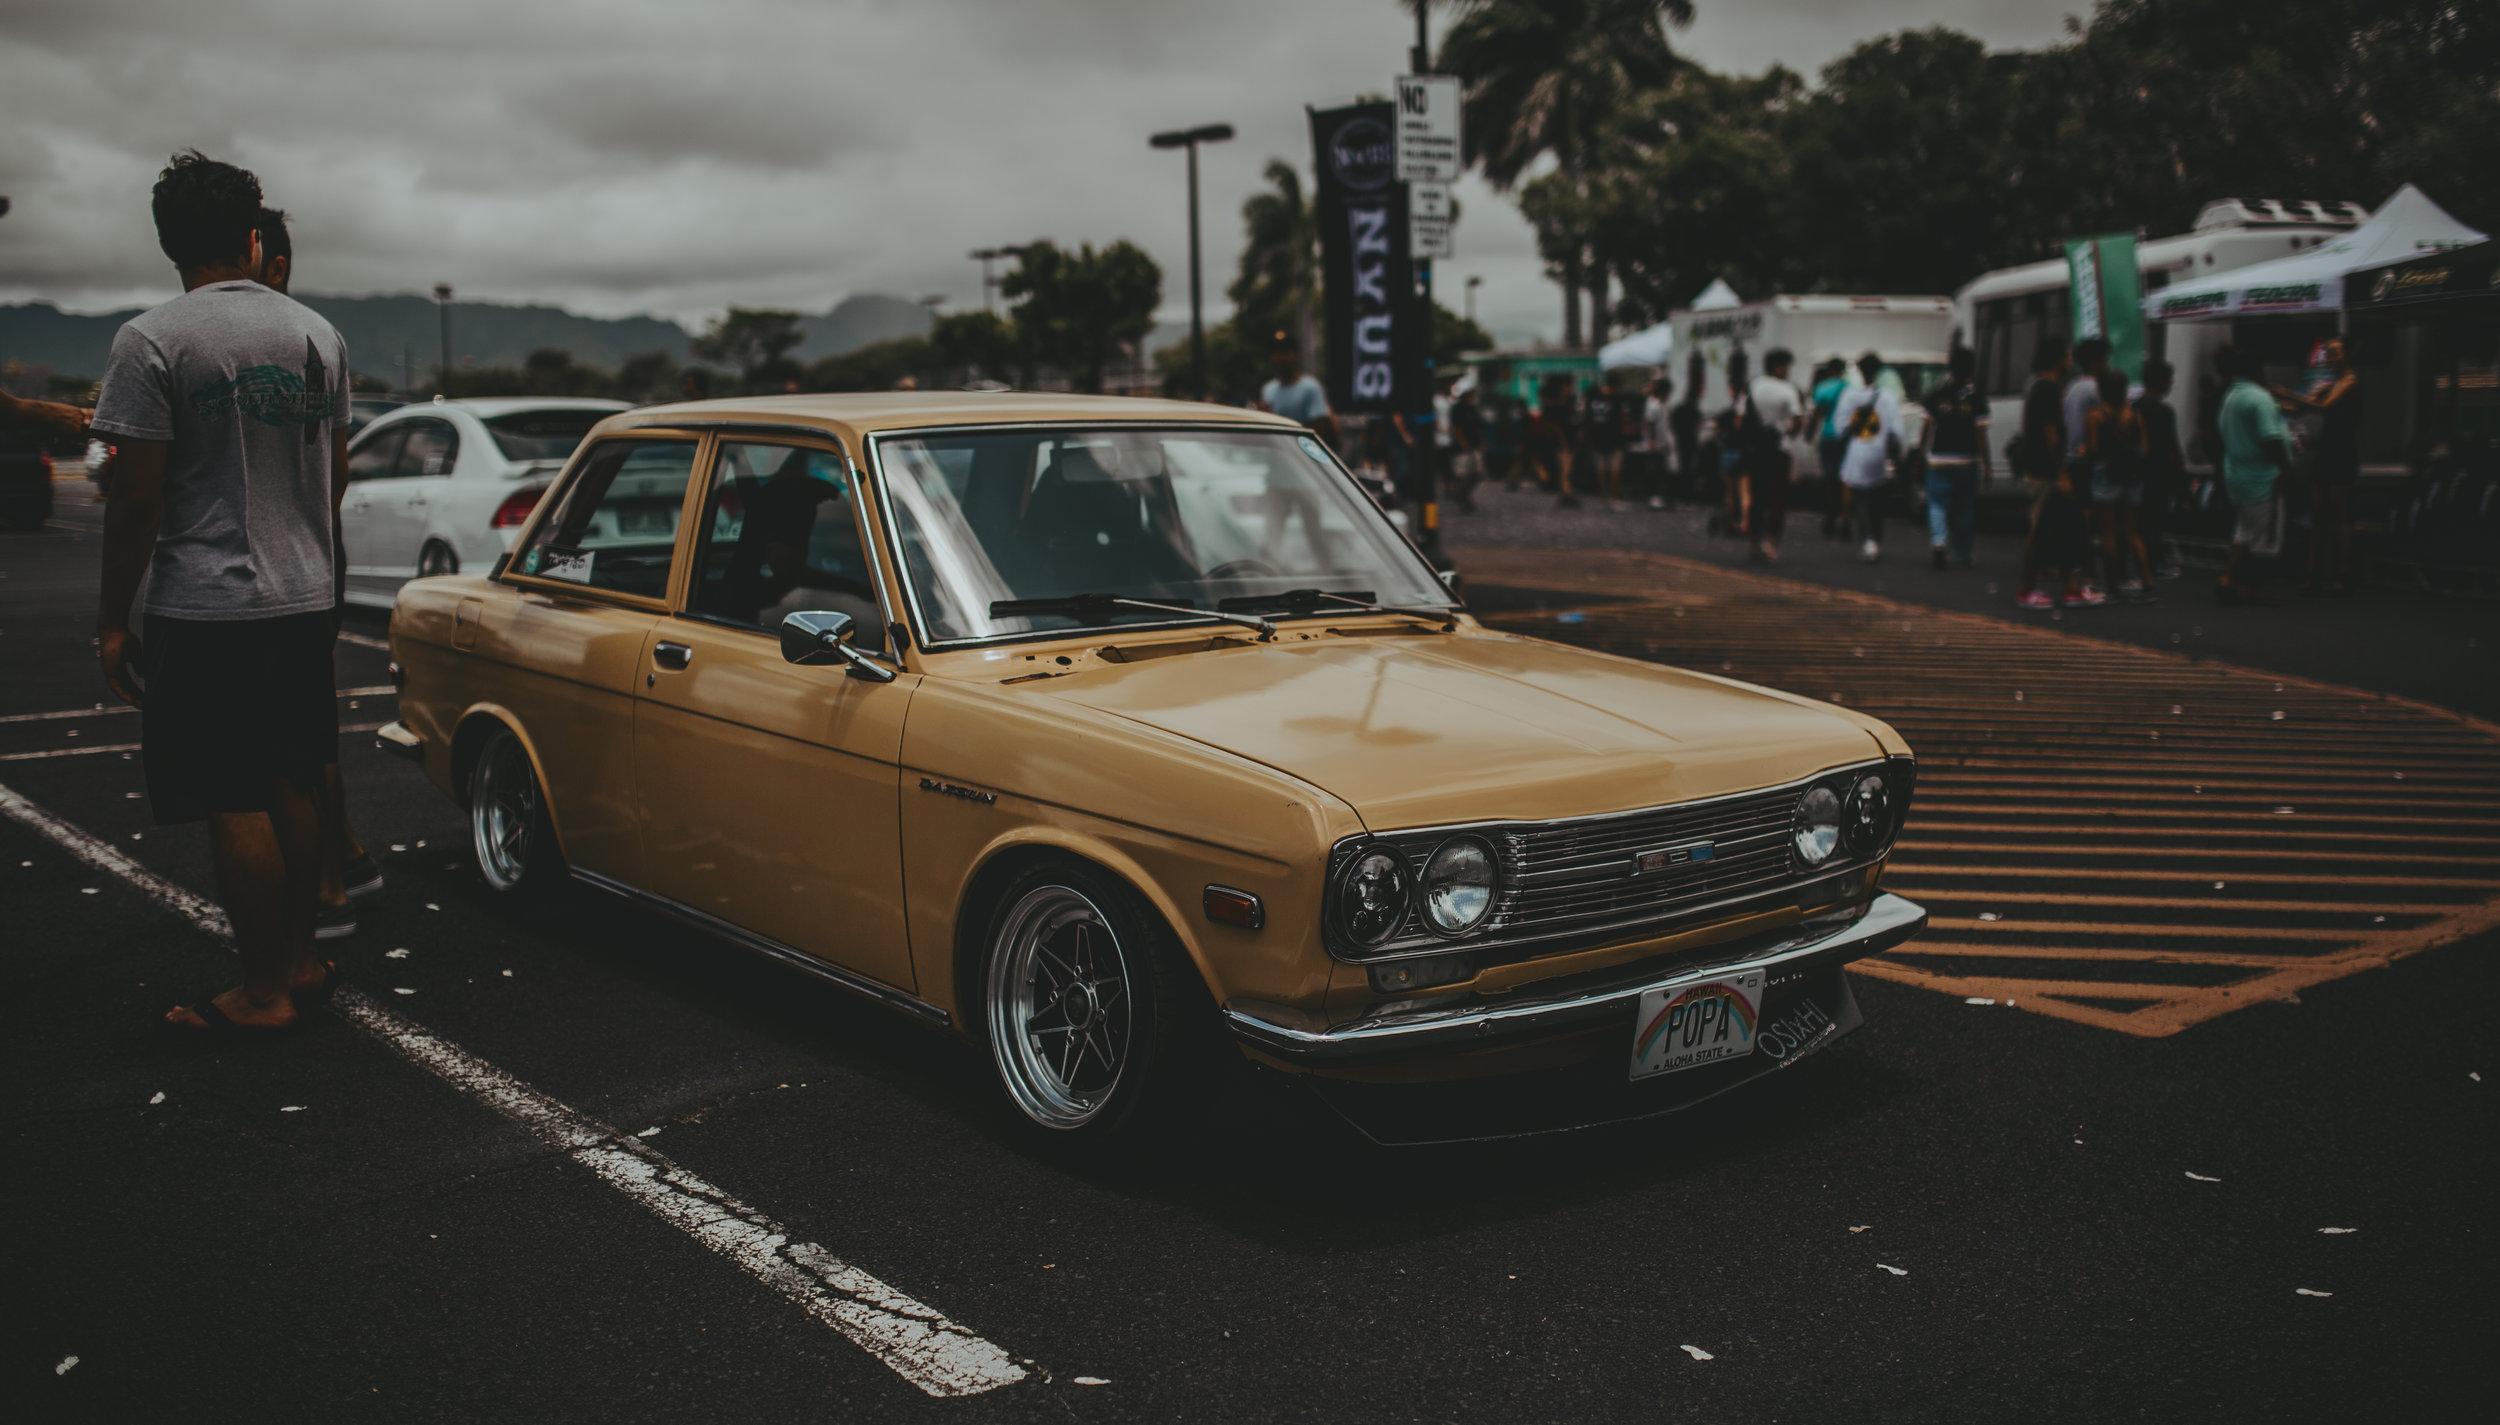 Hawaii photographer, Lifestyle photography, genkimedia, Genkiphotos, Hawaii Automotive photography, Oahu photographer, Hawaii event photography, Cars, Superill Hawaii